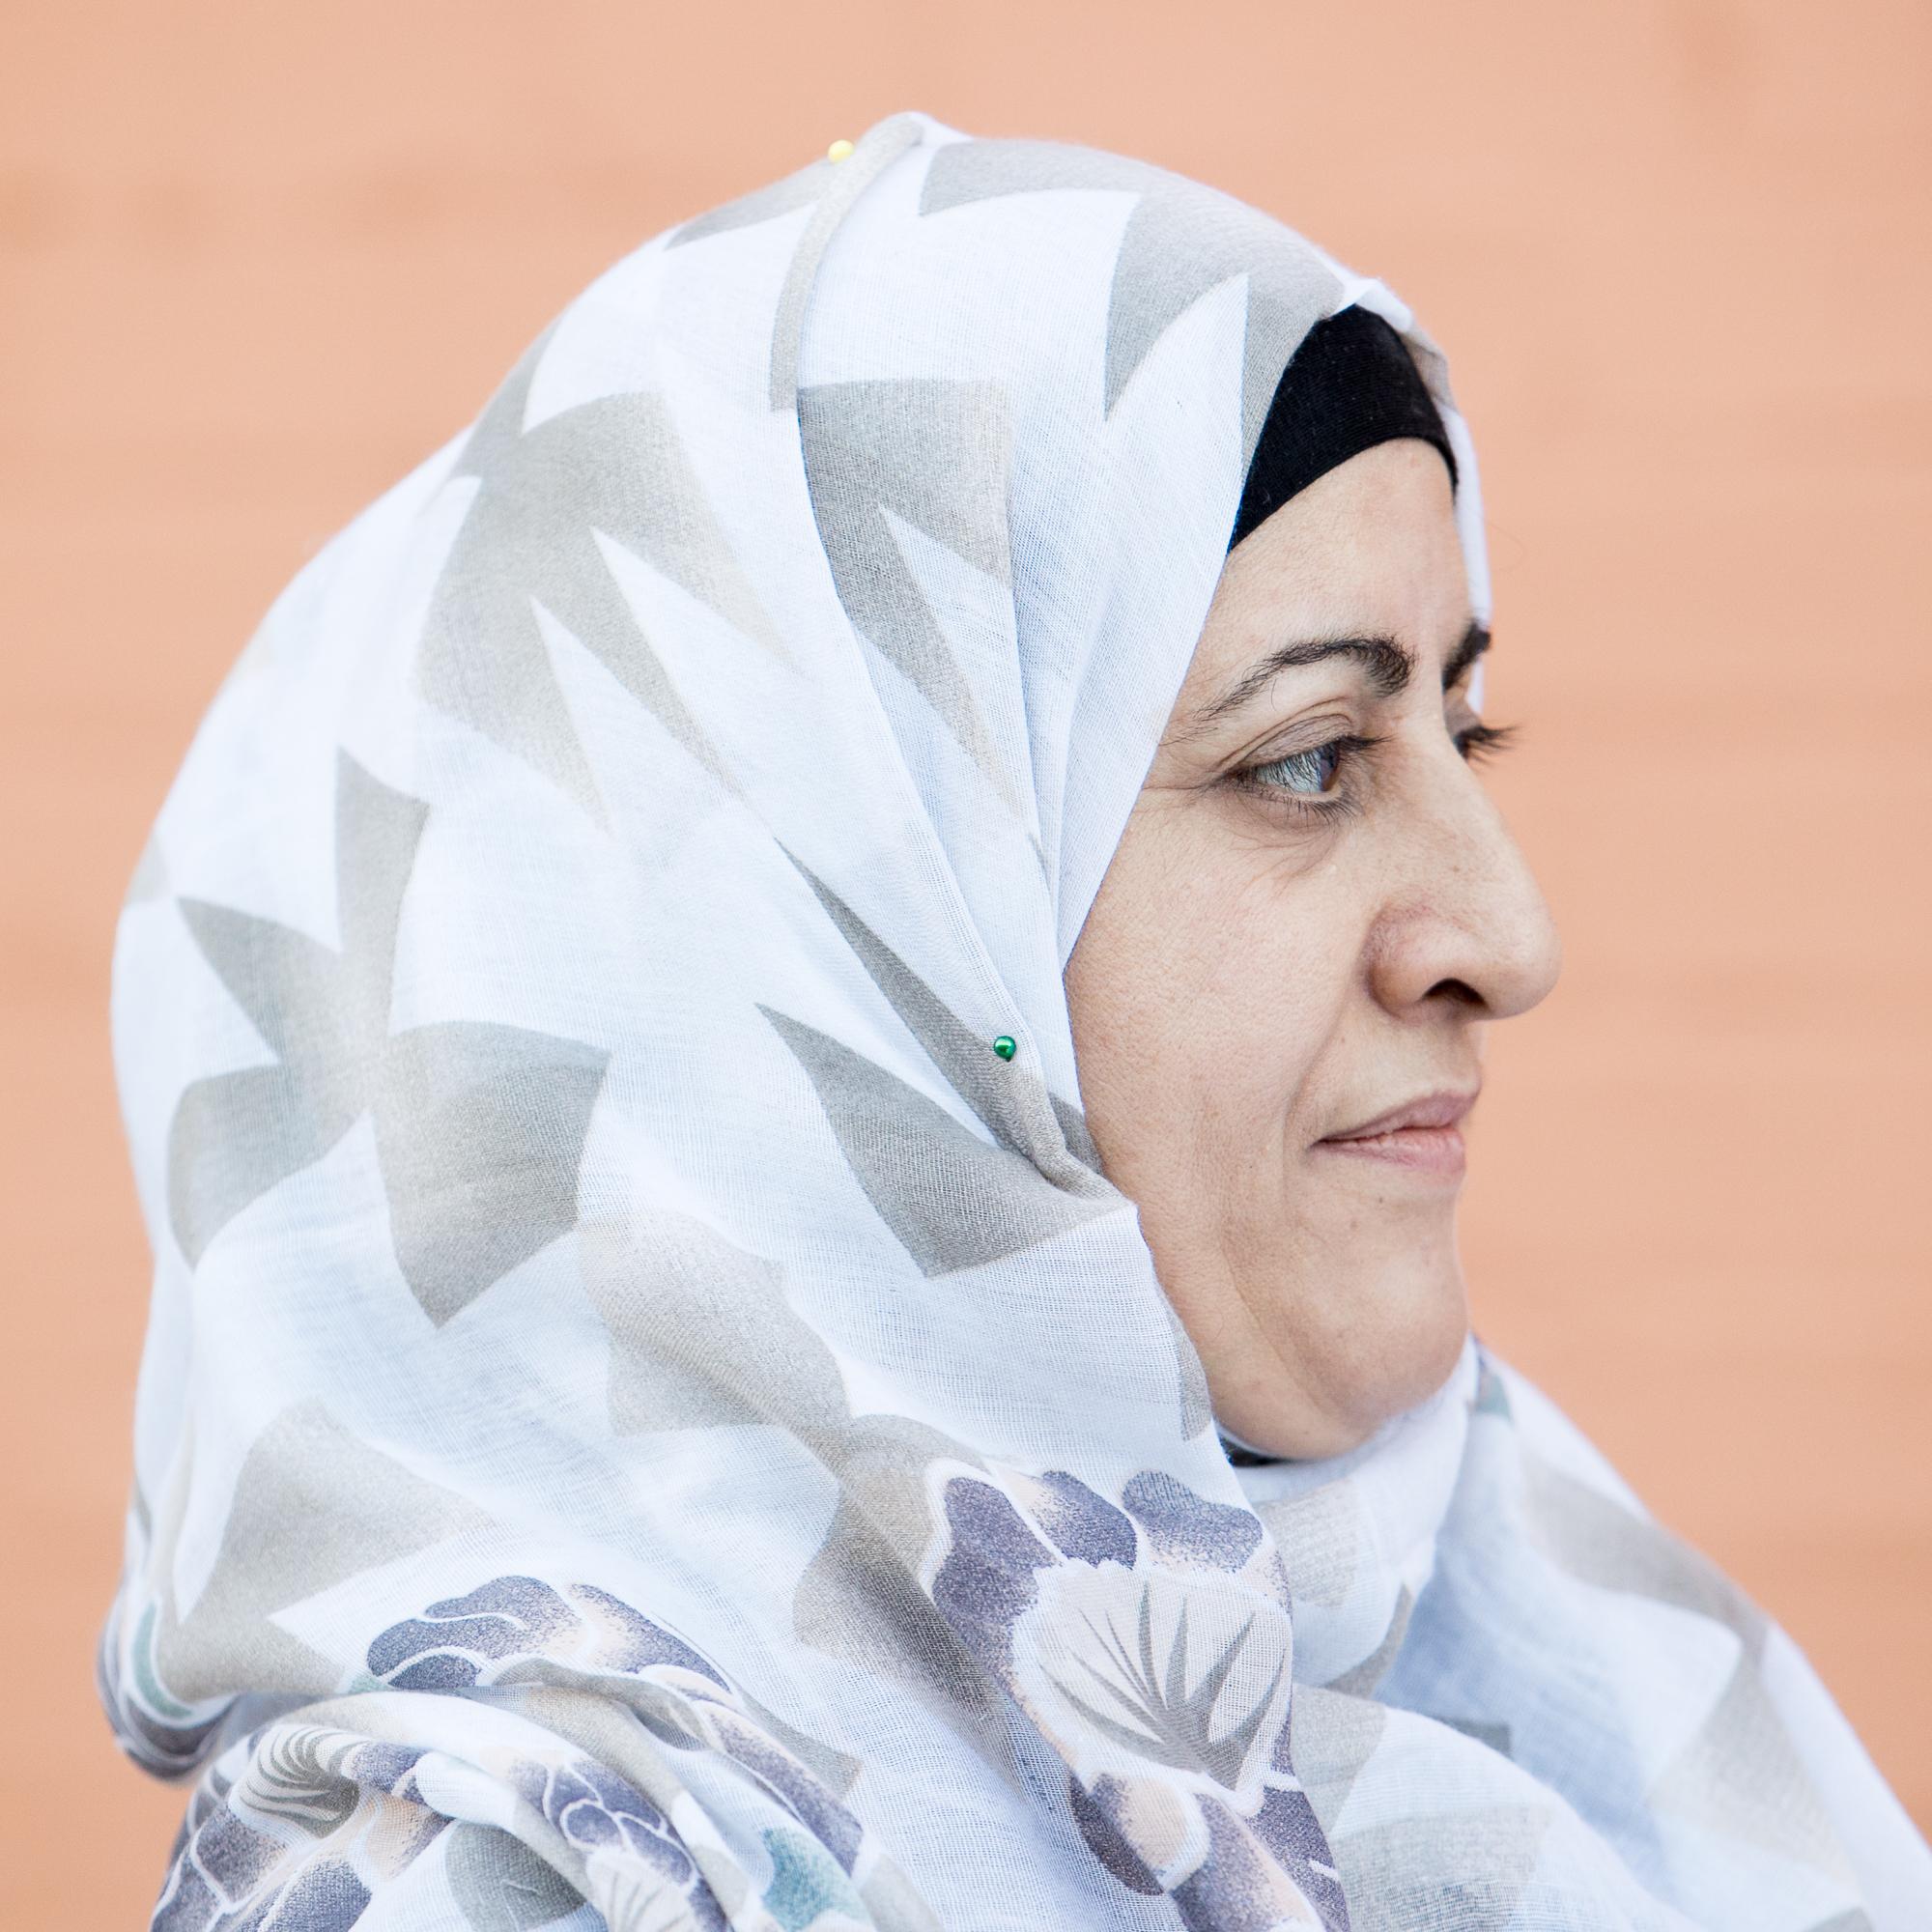 Miriam Azizi, Sewing Apprentice